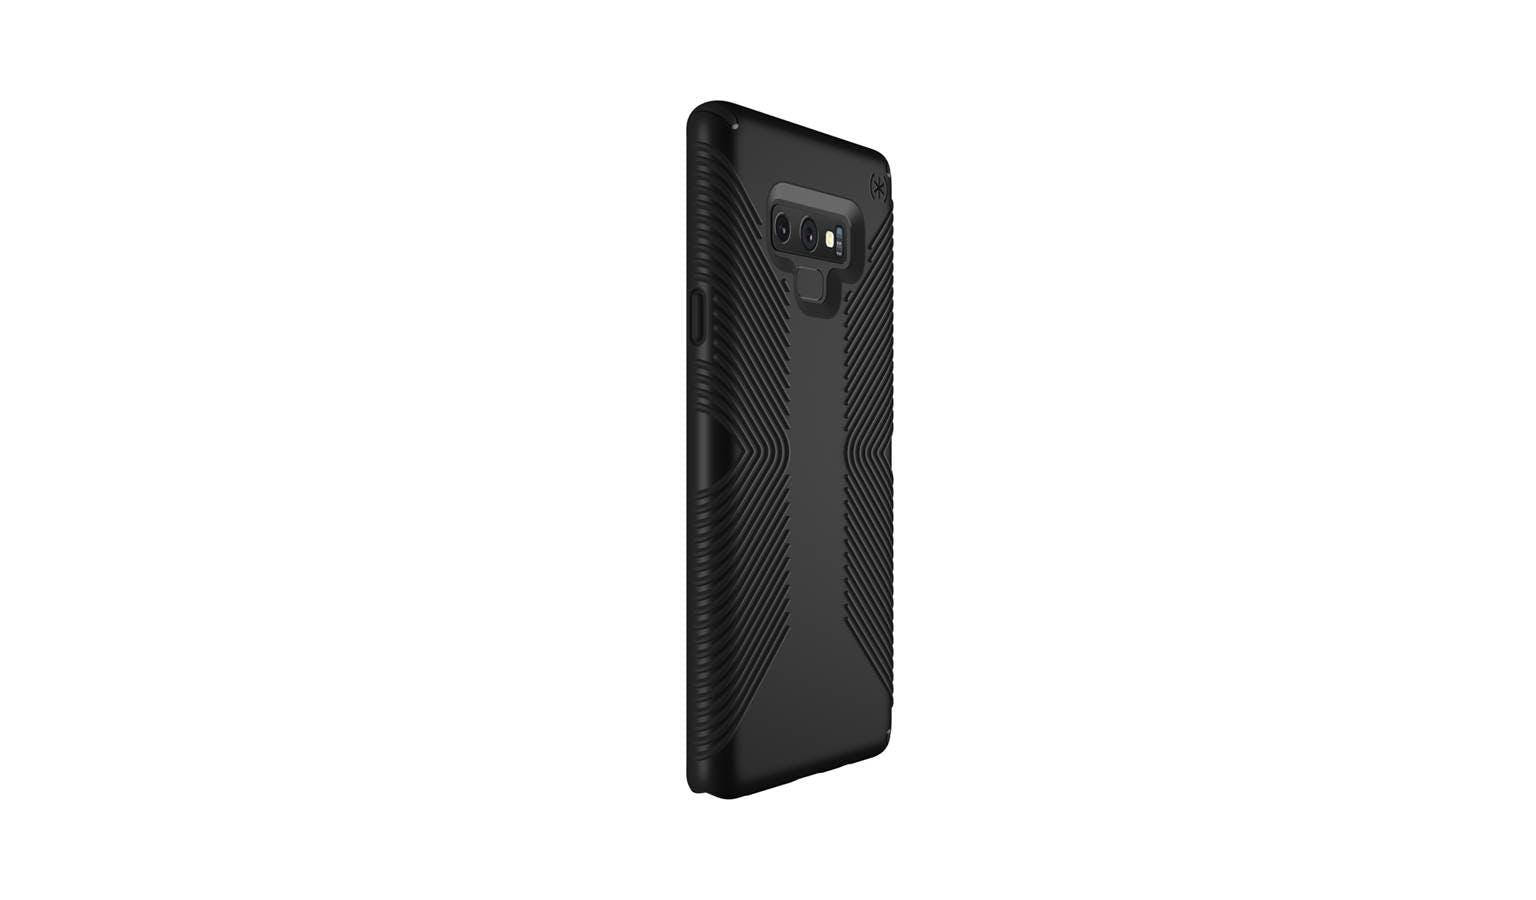 new arrivals 604df 17215 Speck Presidio Grip Galaxy Note 9 Case - Black/Black